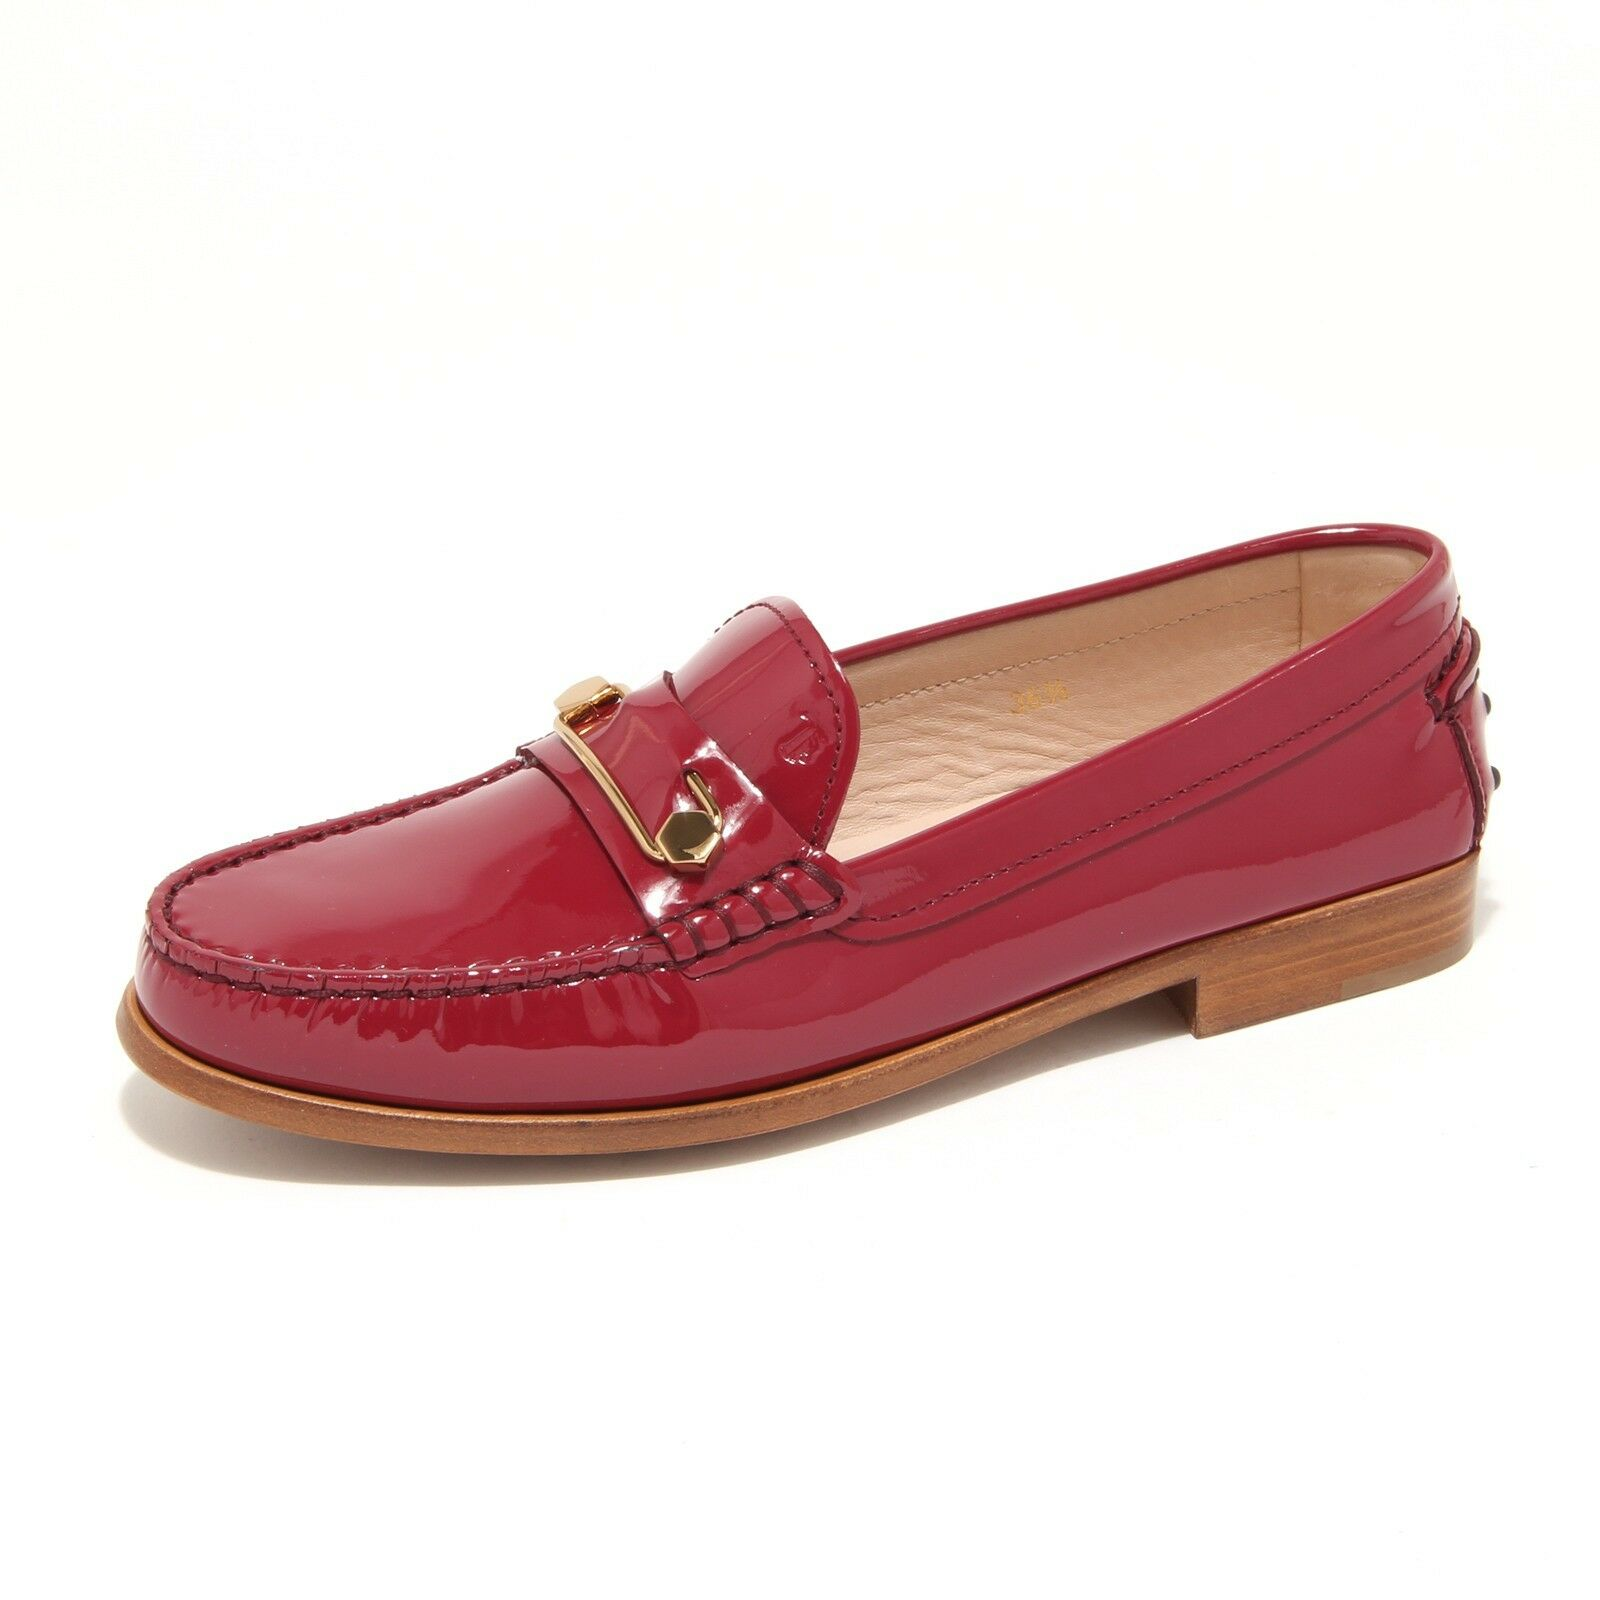 7868L mocassini donna TOD'S cuoio mascherina spilla scarpe loafers shoes women